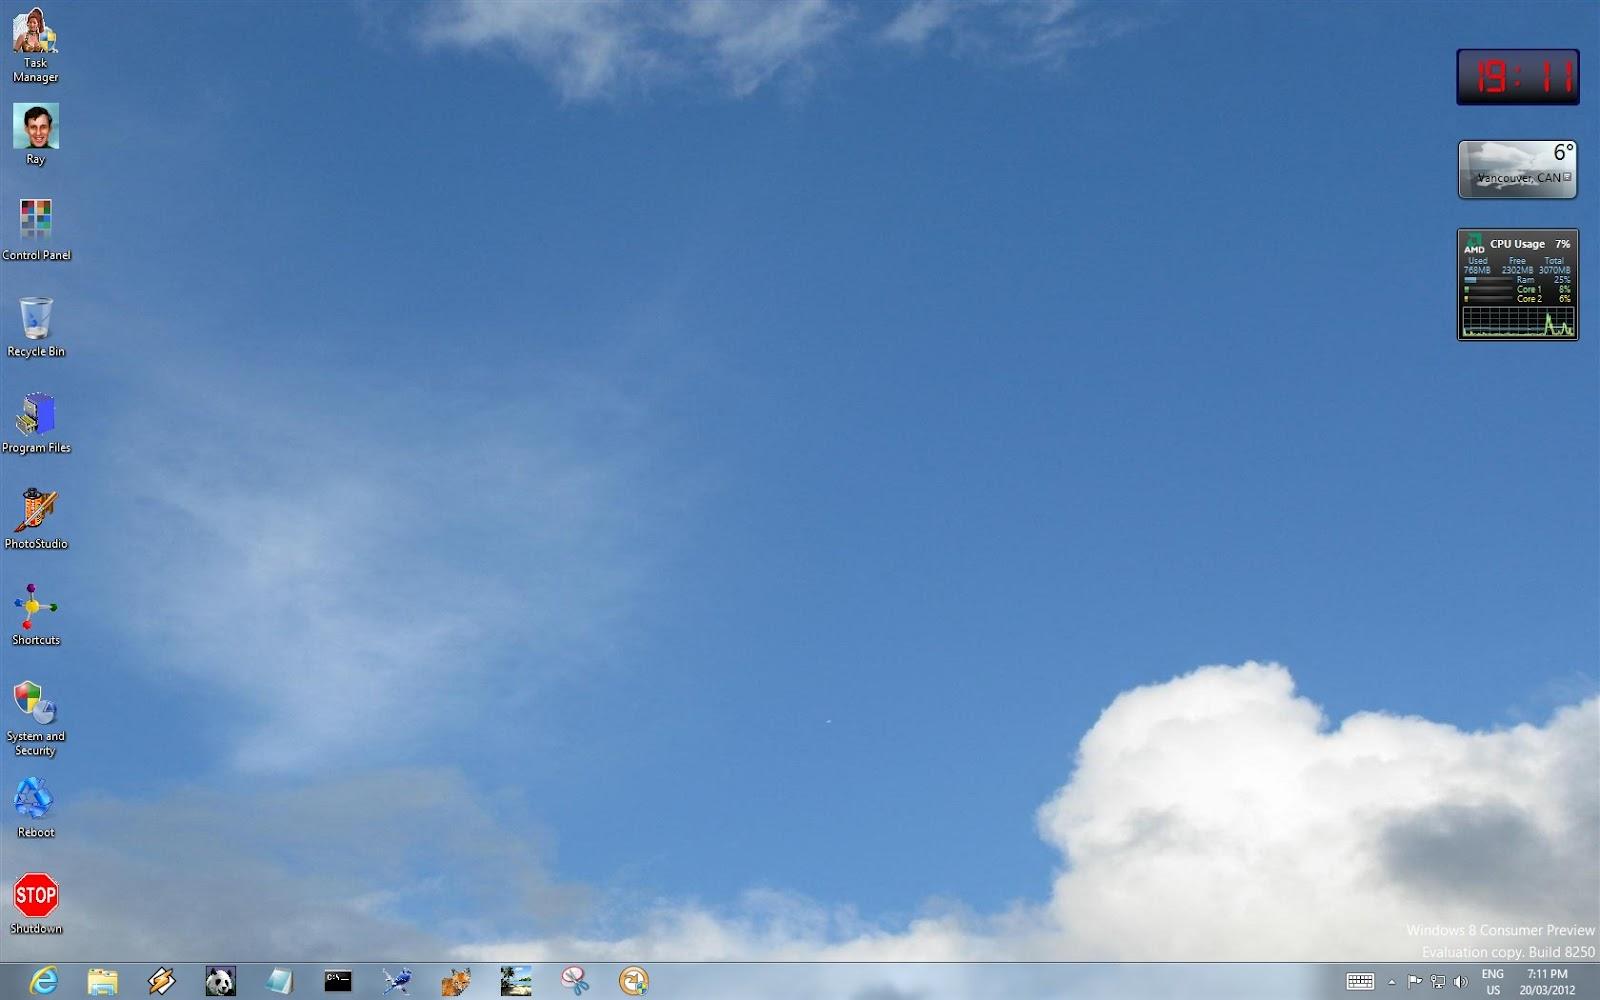 kkk 3walp extend wallpaper across monitors or use a